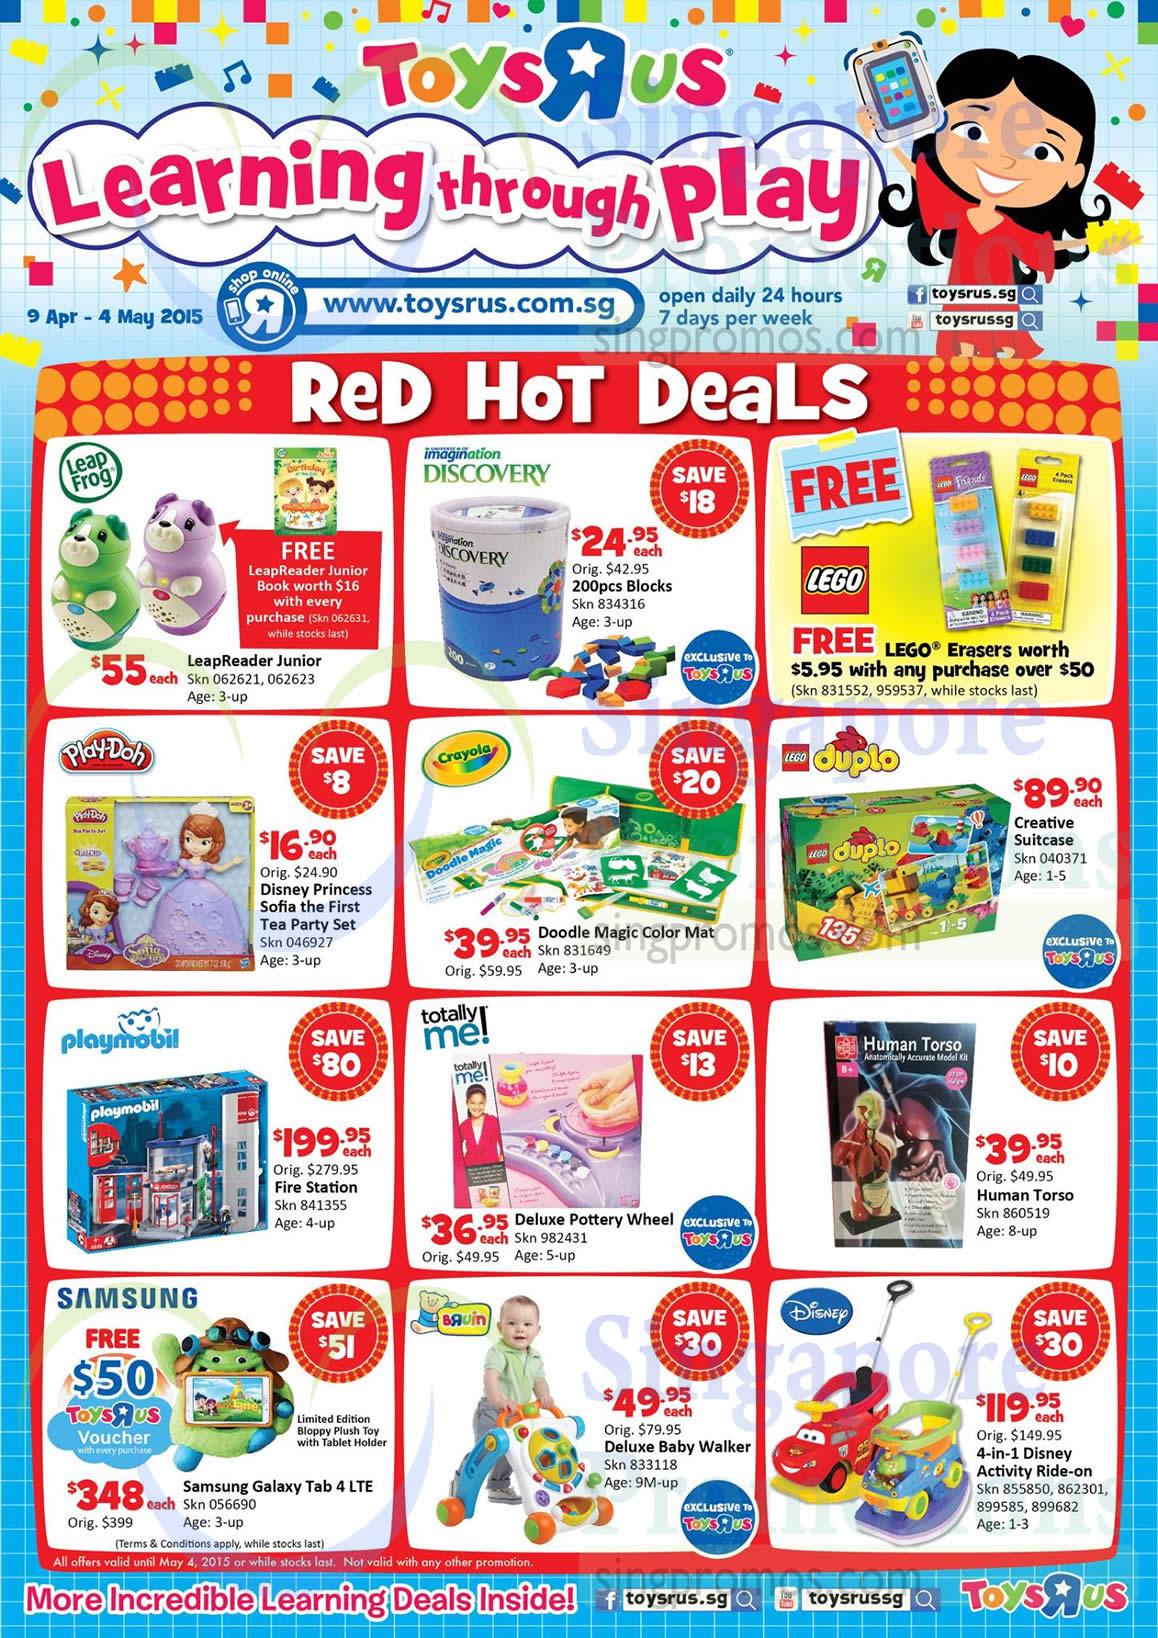 Red Hot Deals Toys, LeapFrog, Imagination Discovery, Lego, Play Doh, Crayola, Duplo, Playmobil, Human Torso, Disney